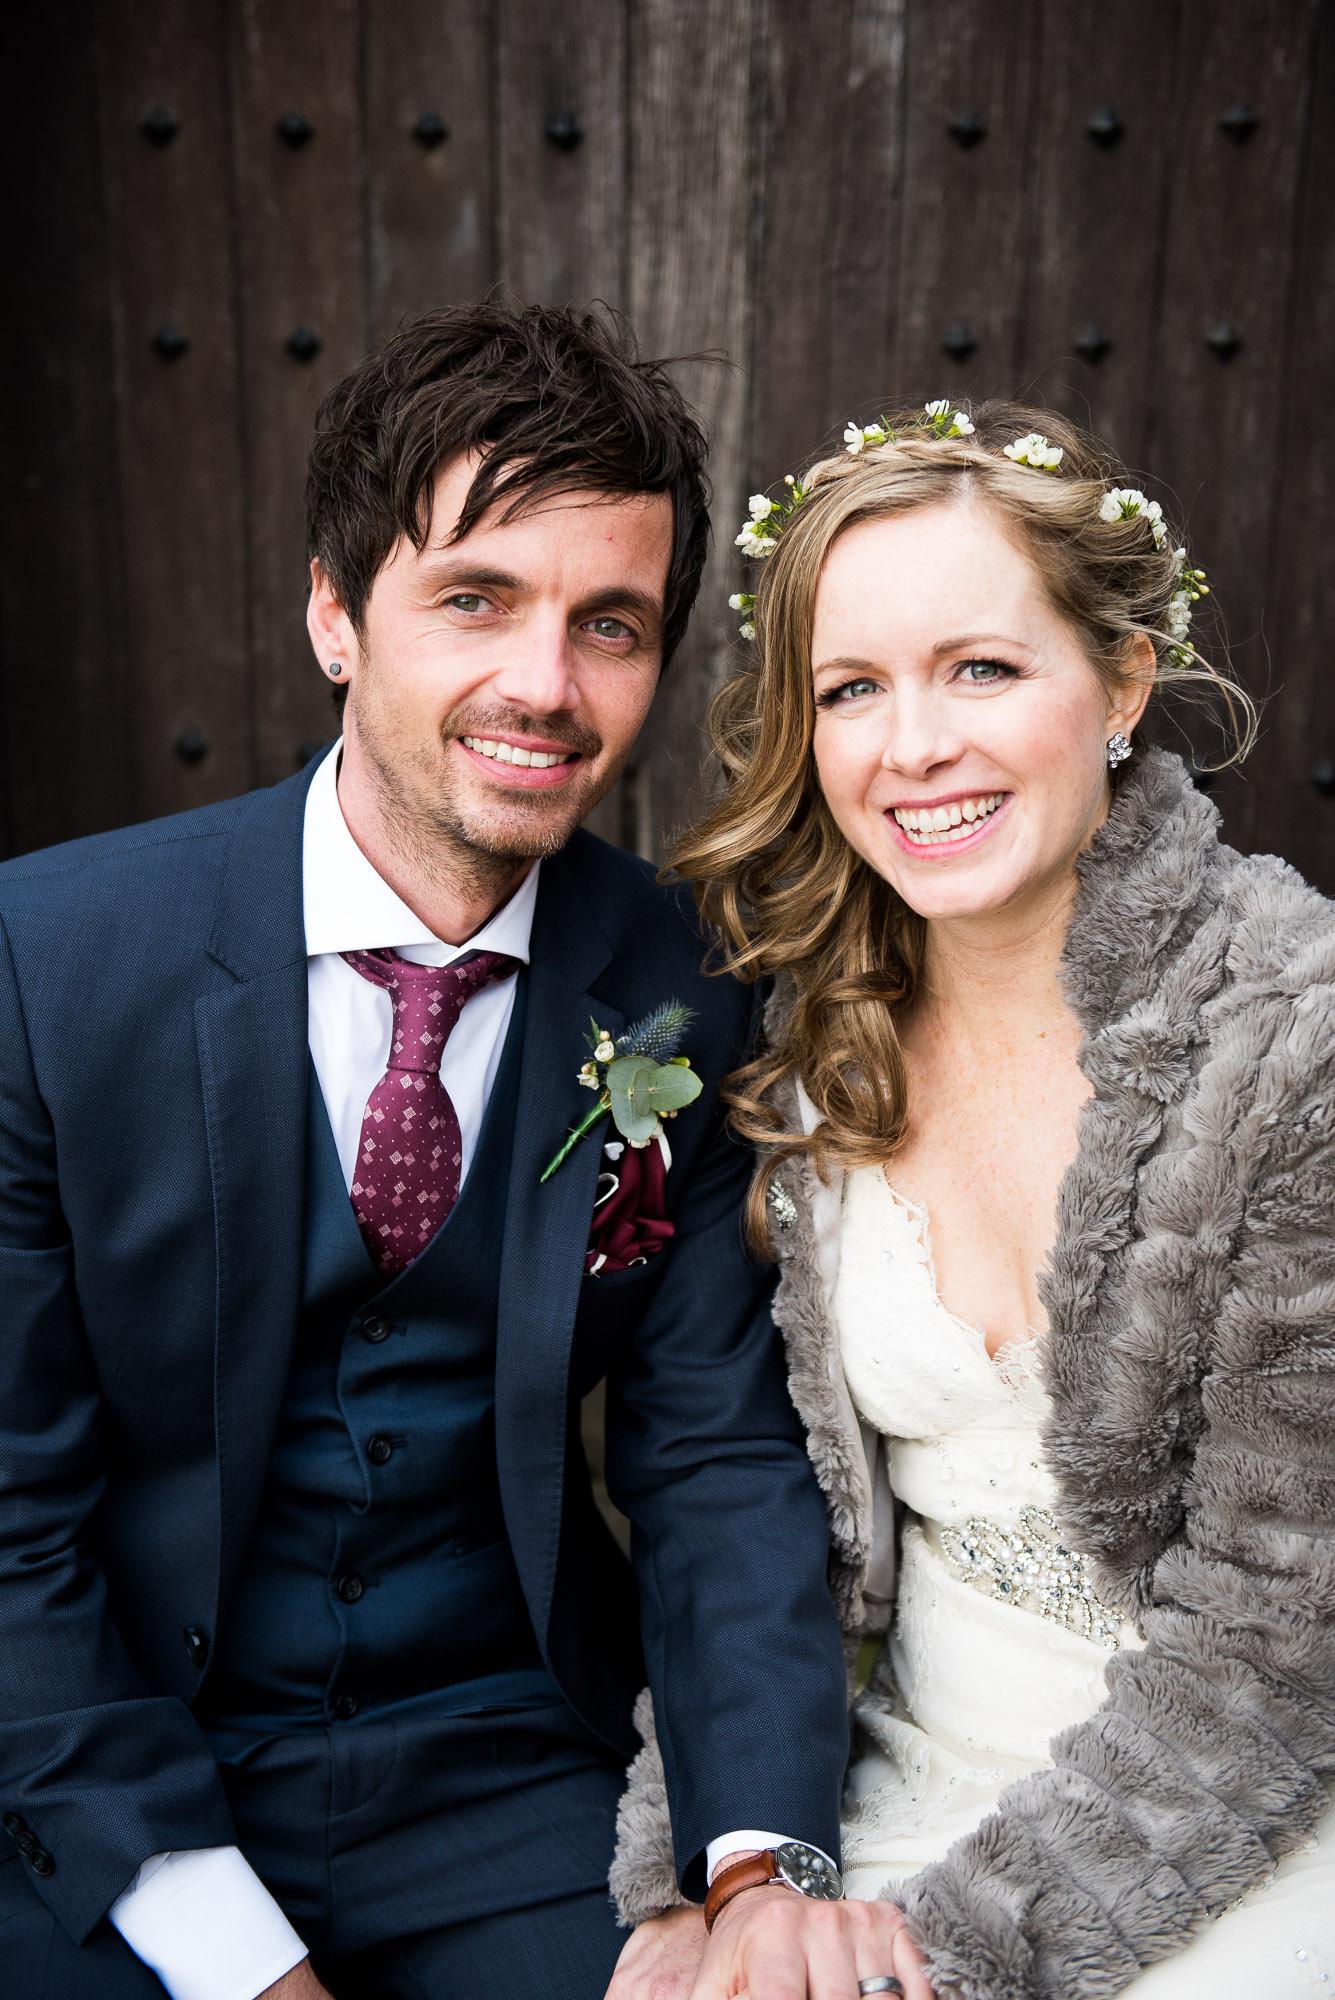 Smiling bride with groom Essex Barn wedding